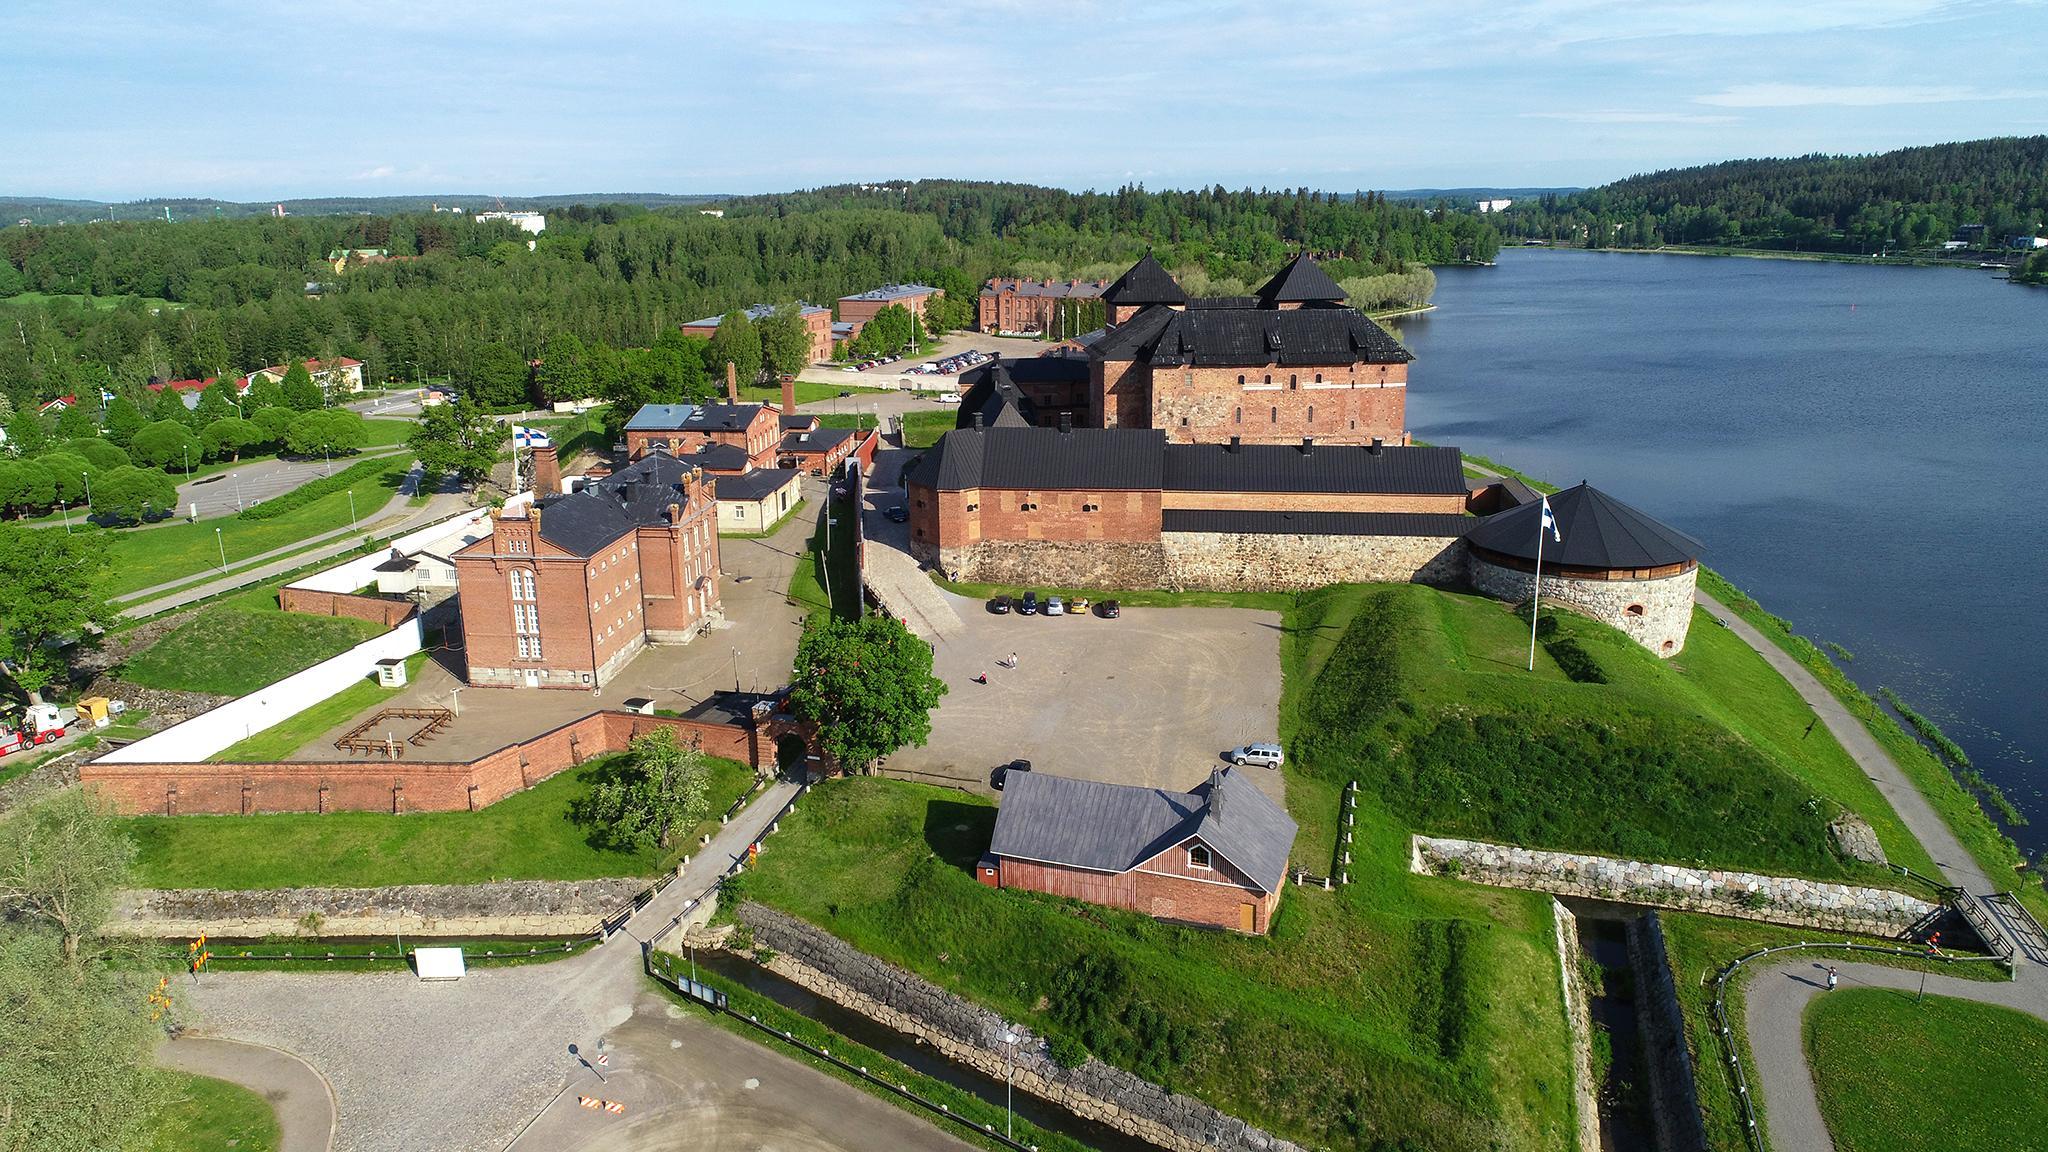 Valokuvaaja Timo Ahola - Drone-ilmakuvaus - Hämeen Linna - Hämeenlinna (c) Valokuvaaja Timo Ahola